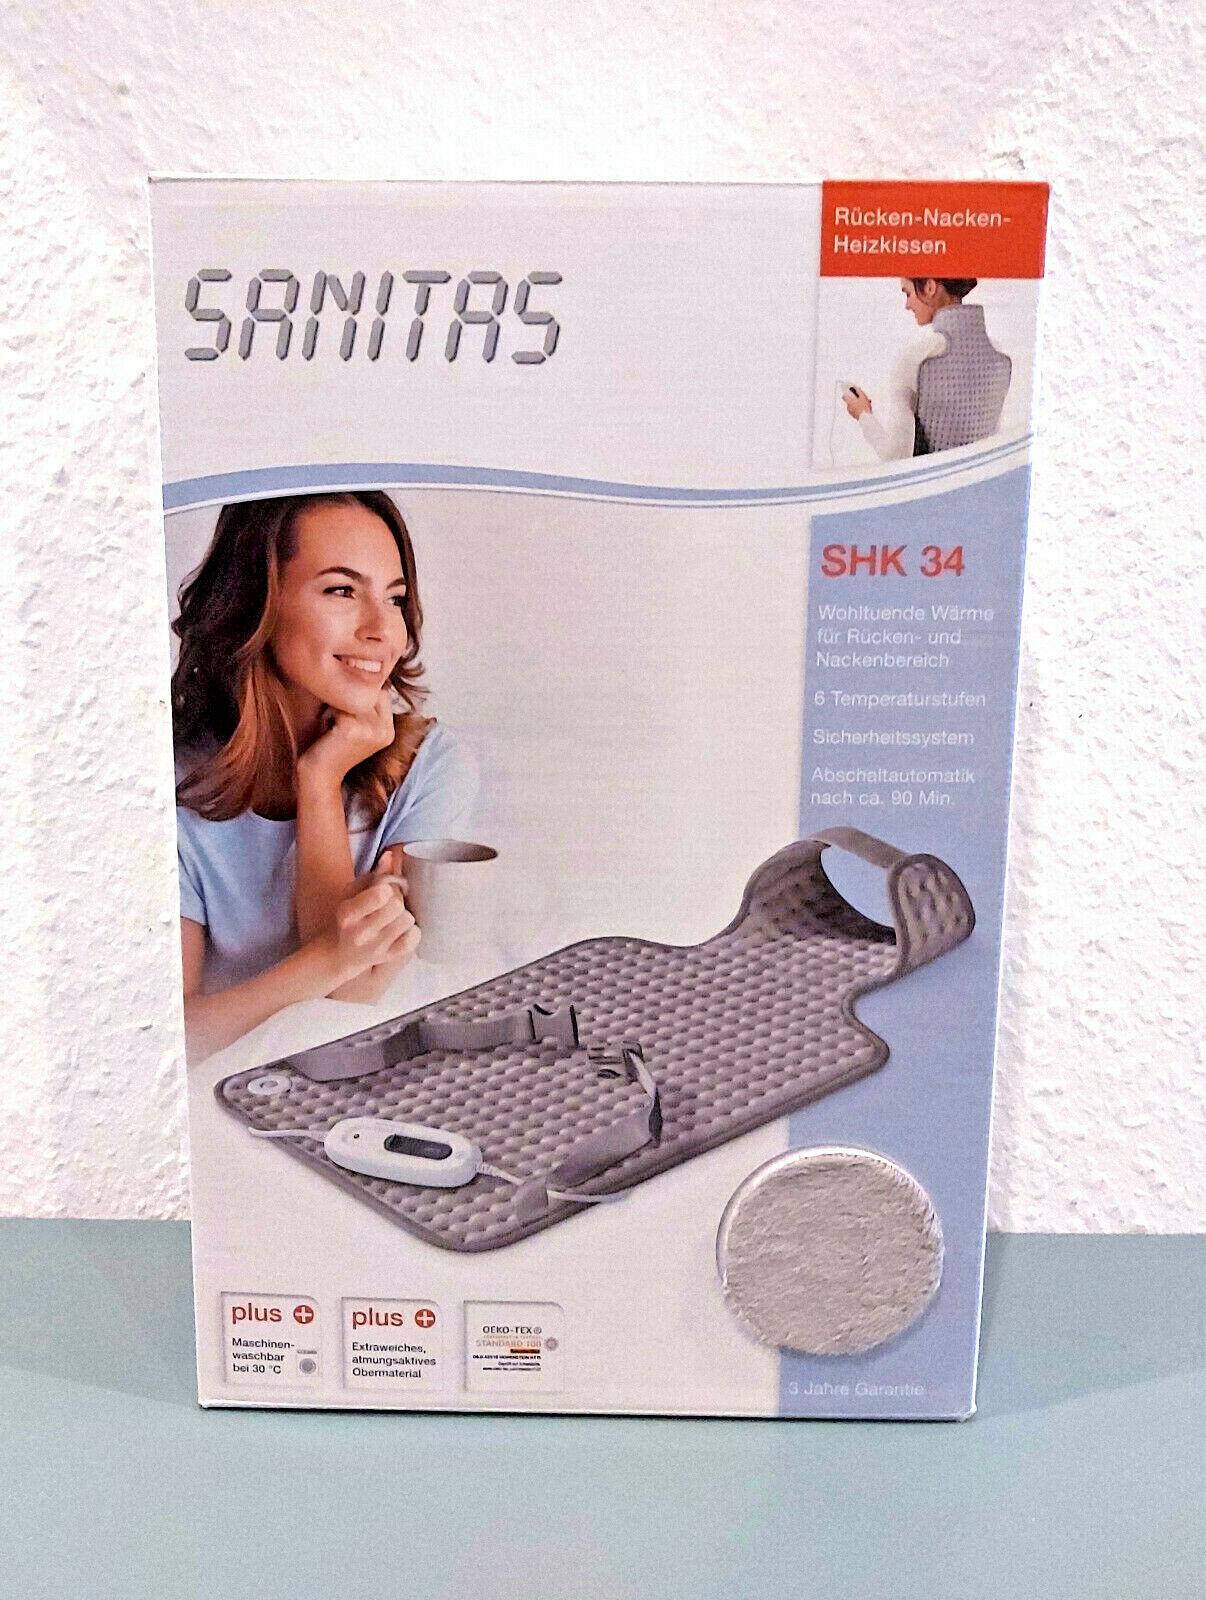 Sanitas SHK 34 Rücken-Nacken-Heizkissen Wärmegerät (Neu OVP)